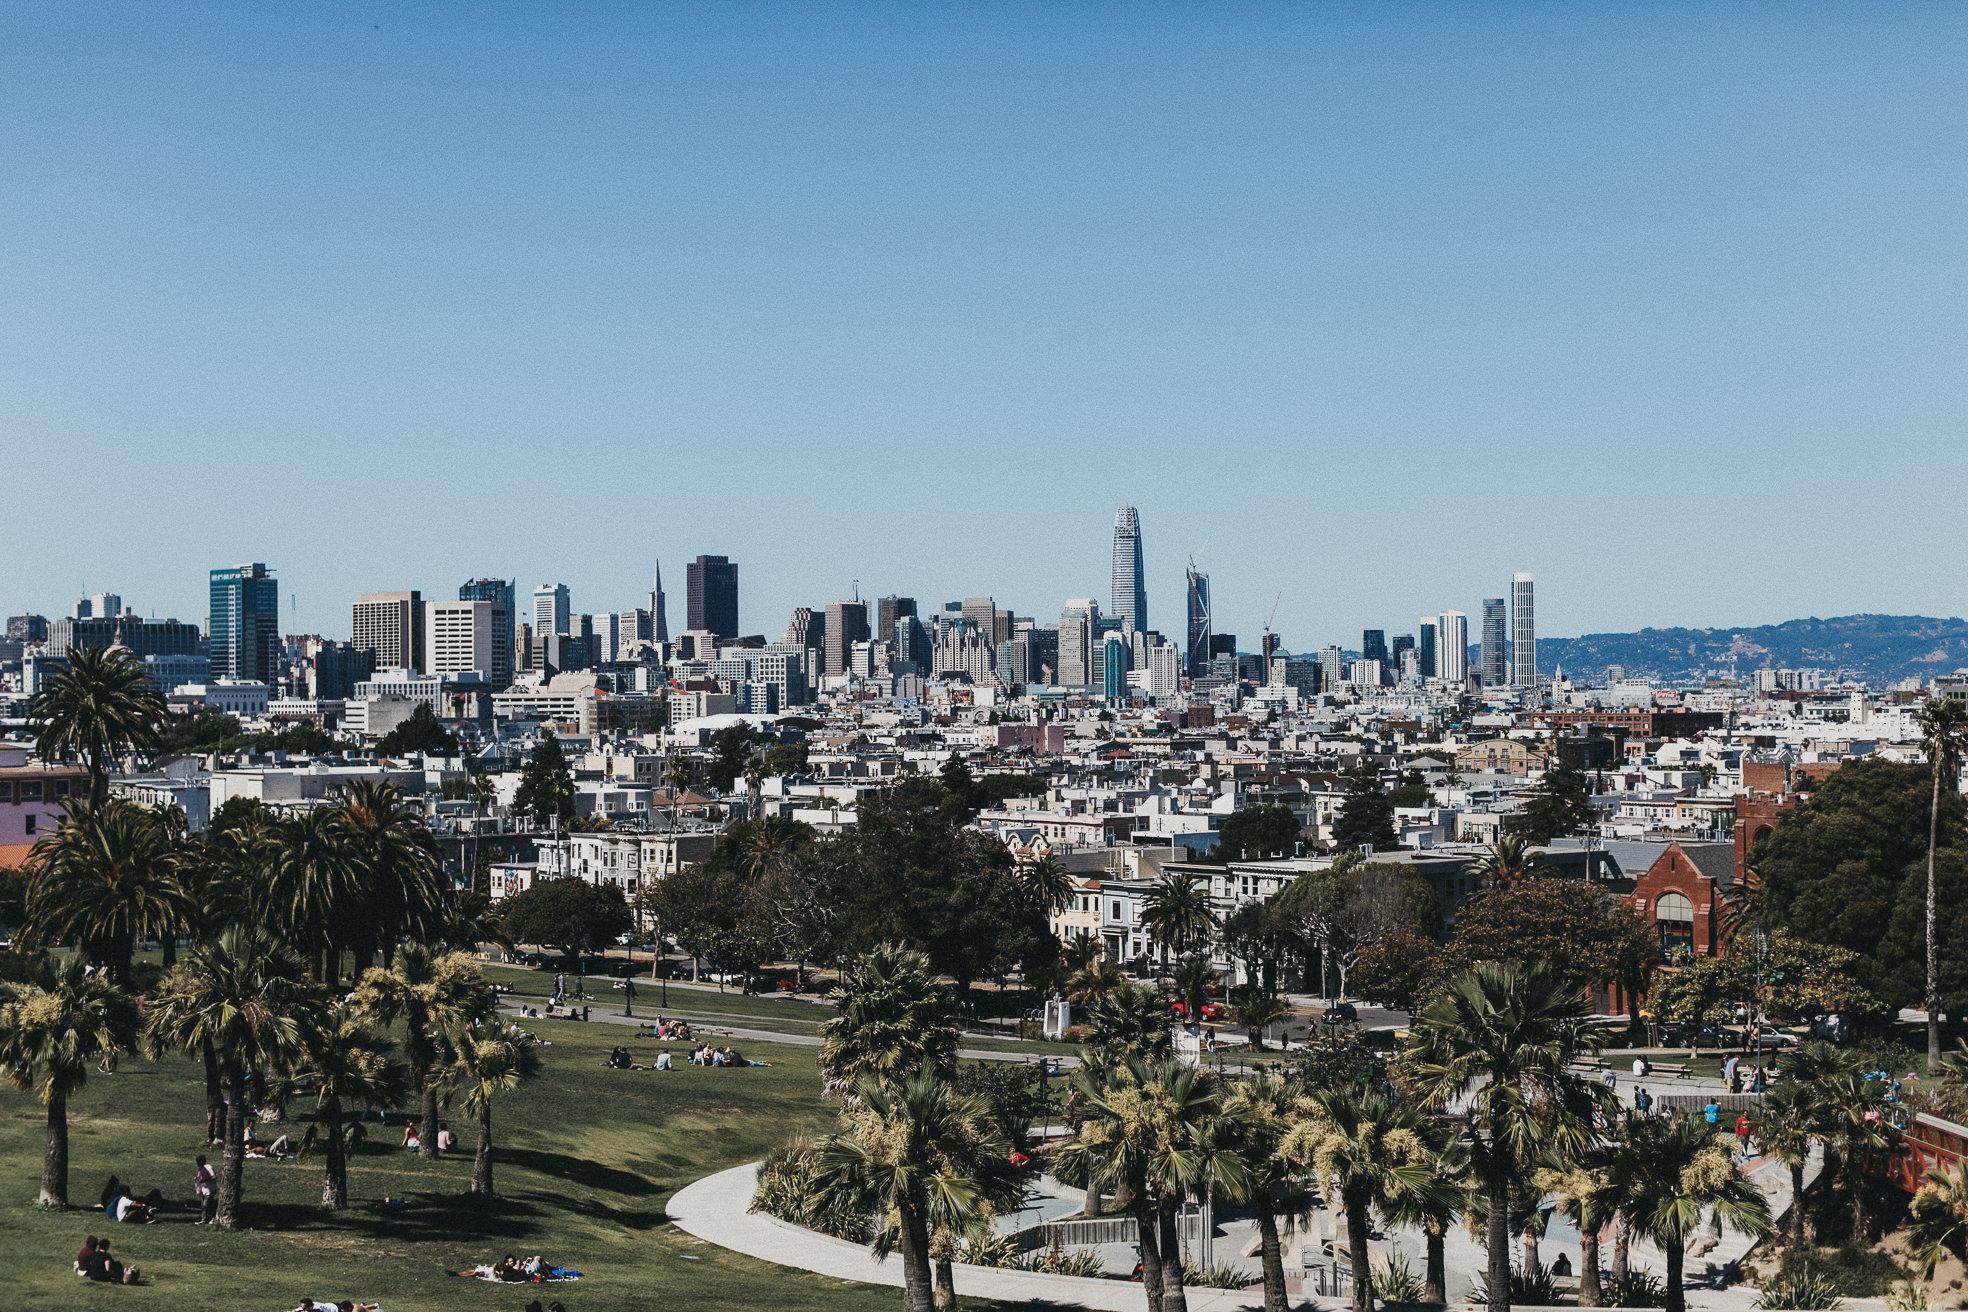 San-Francisco-BildervomLeben-5271